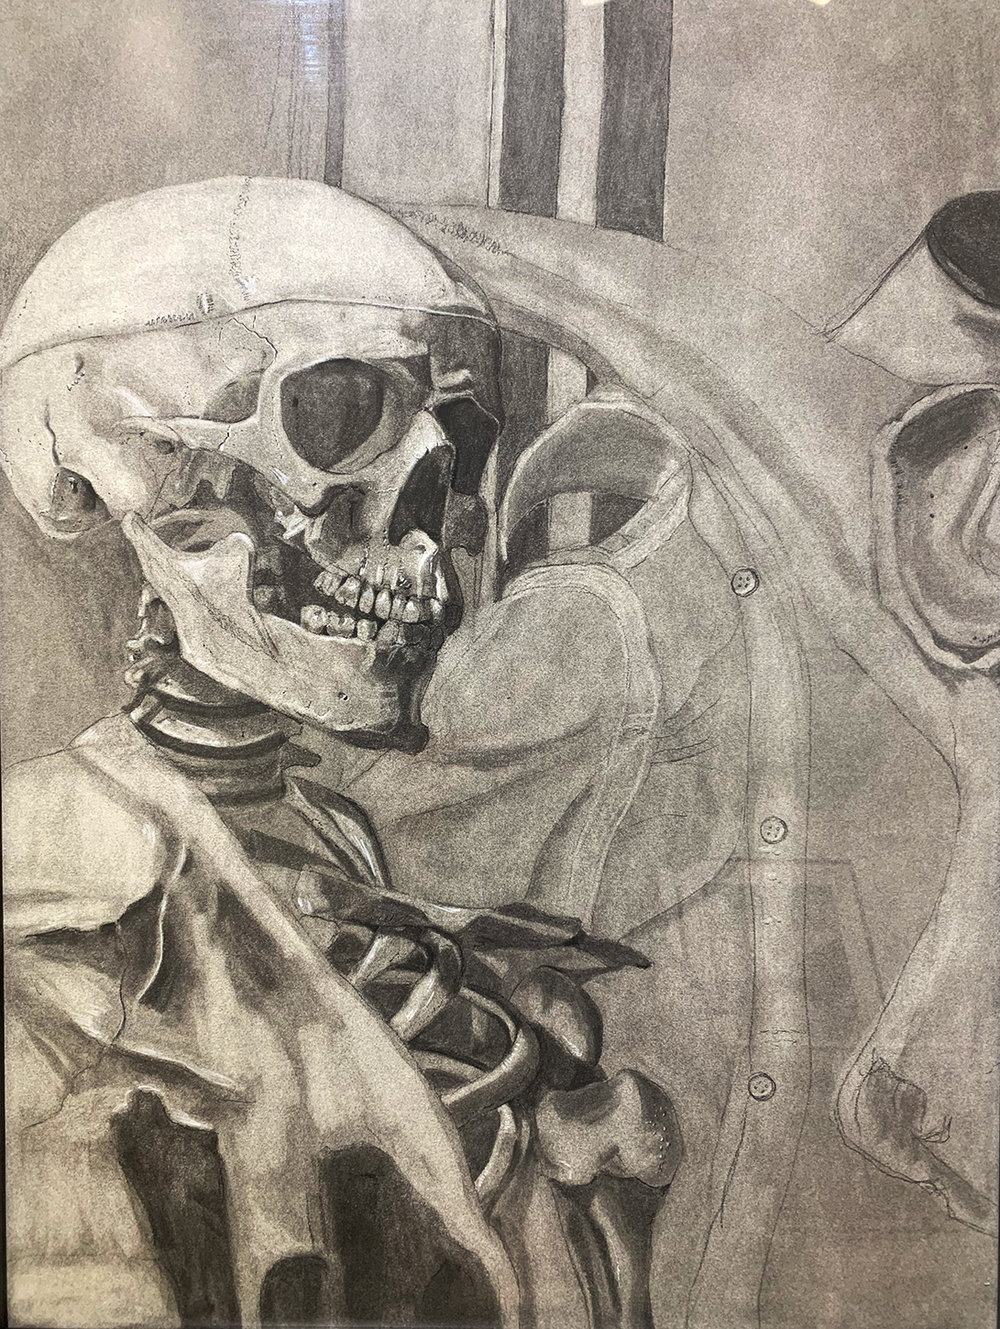 ARE-Skeleton-Charcoal-1.jpg